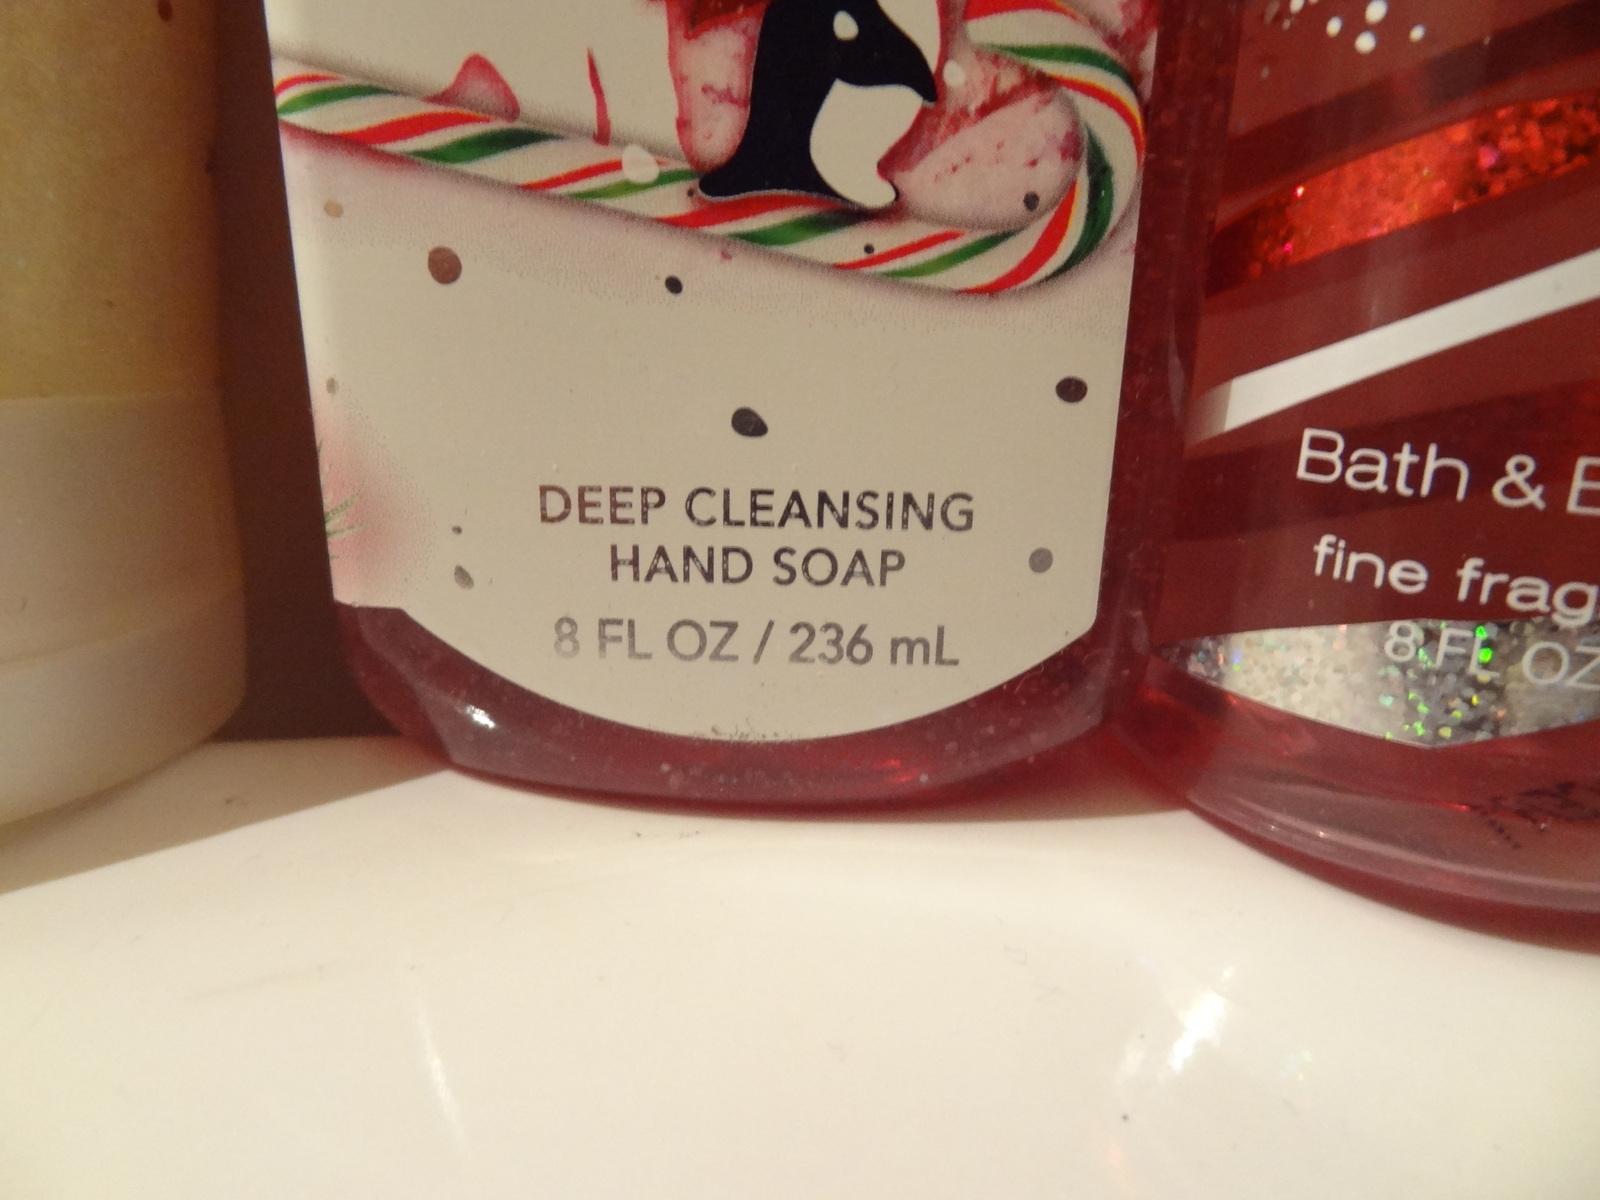 BATH & BODY WORKS SET OF 3 TWISTED PEPPERMINT FRAGRANCE MIST SCRUB HAND SOAP NEW